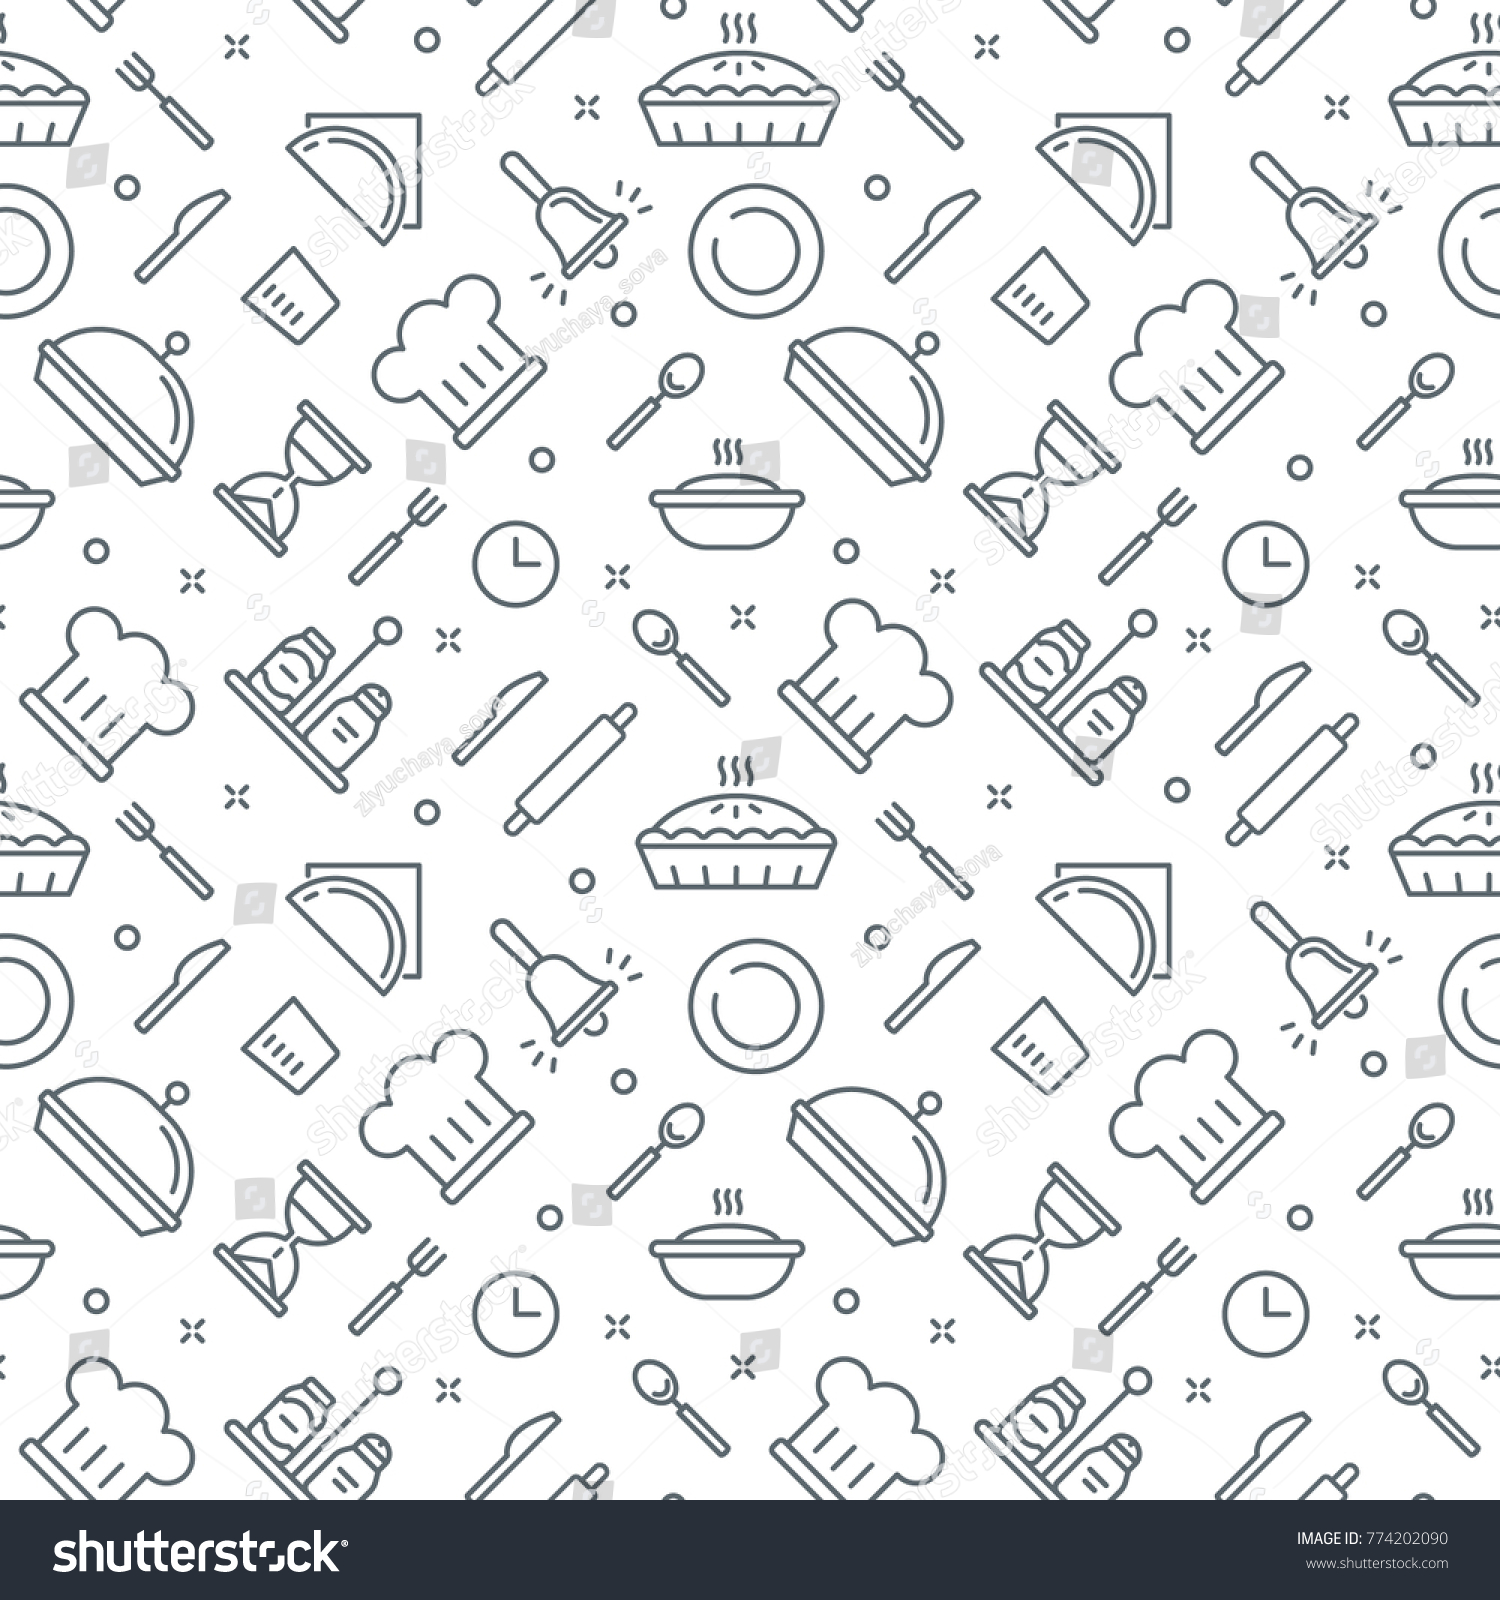 Kitchen Pattern Seamless Vector Texture Bakery Stock Vector HD ...